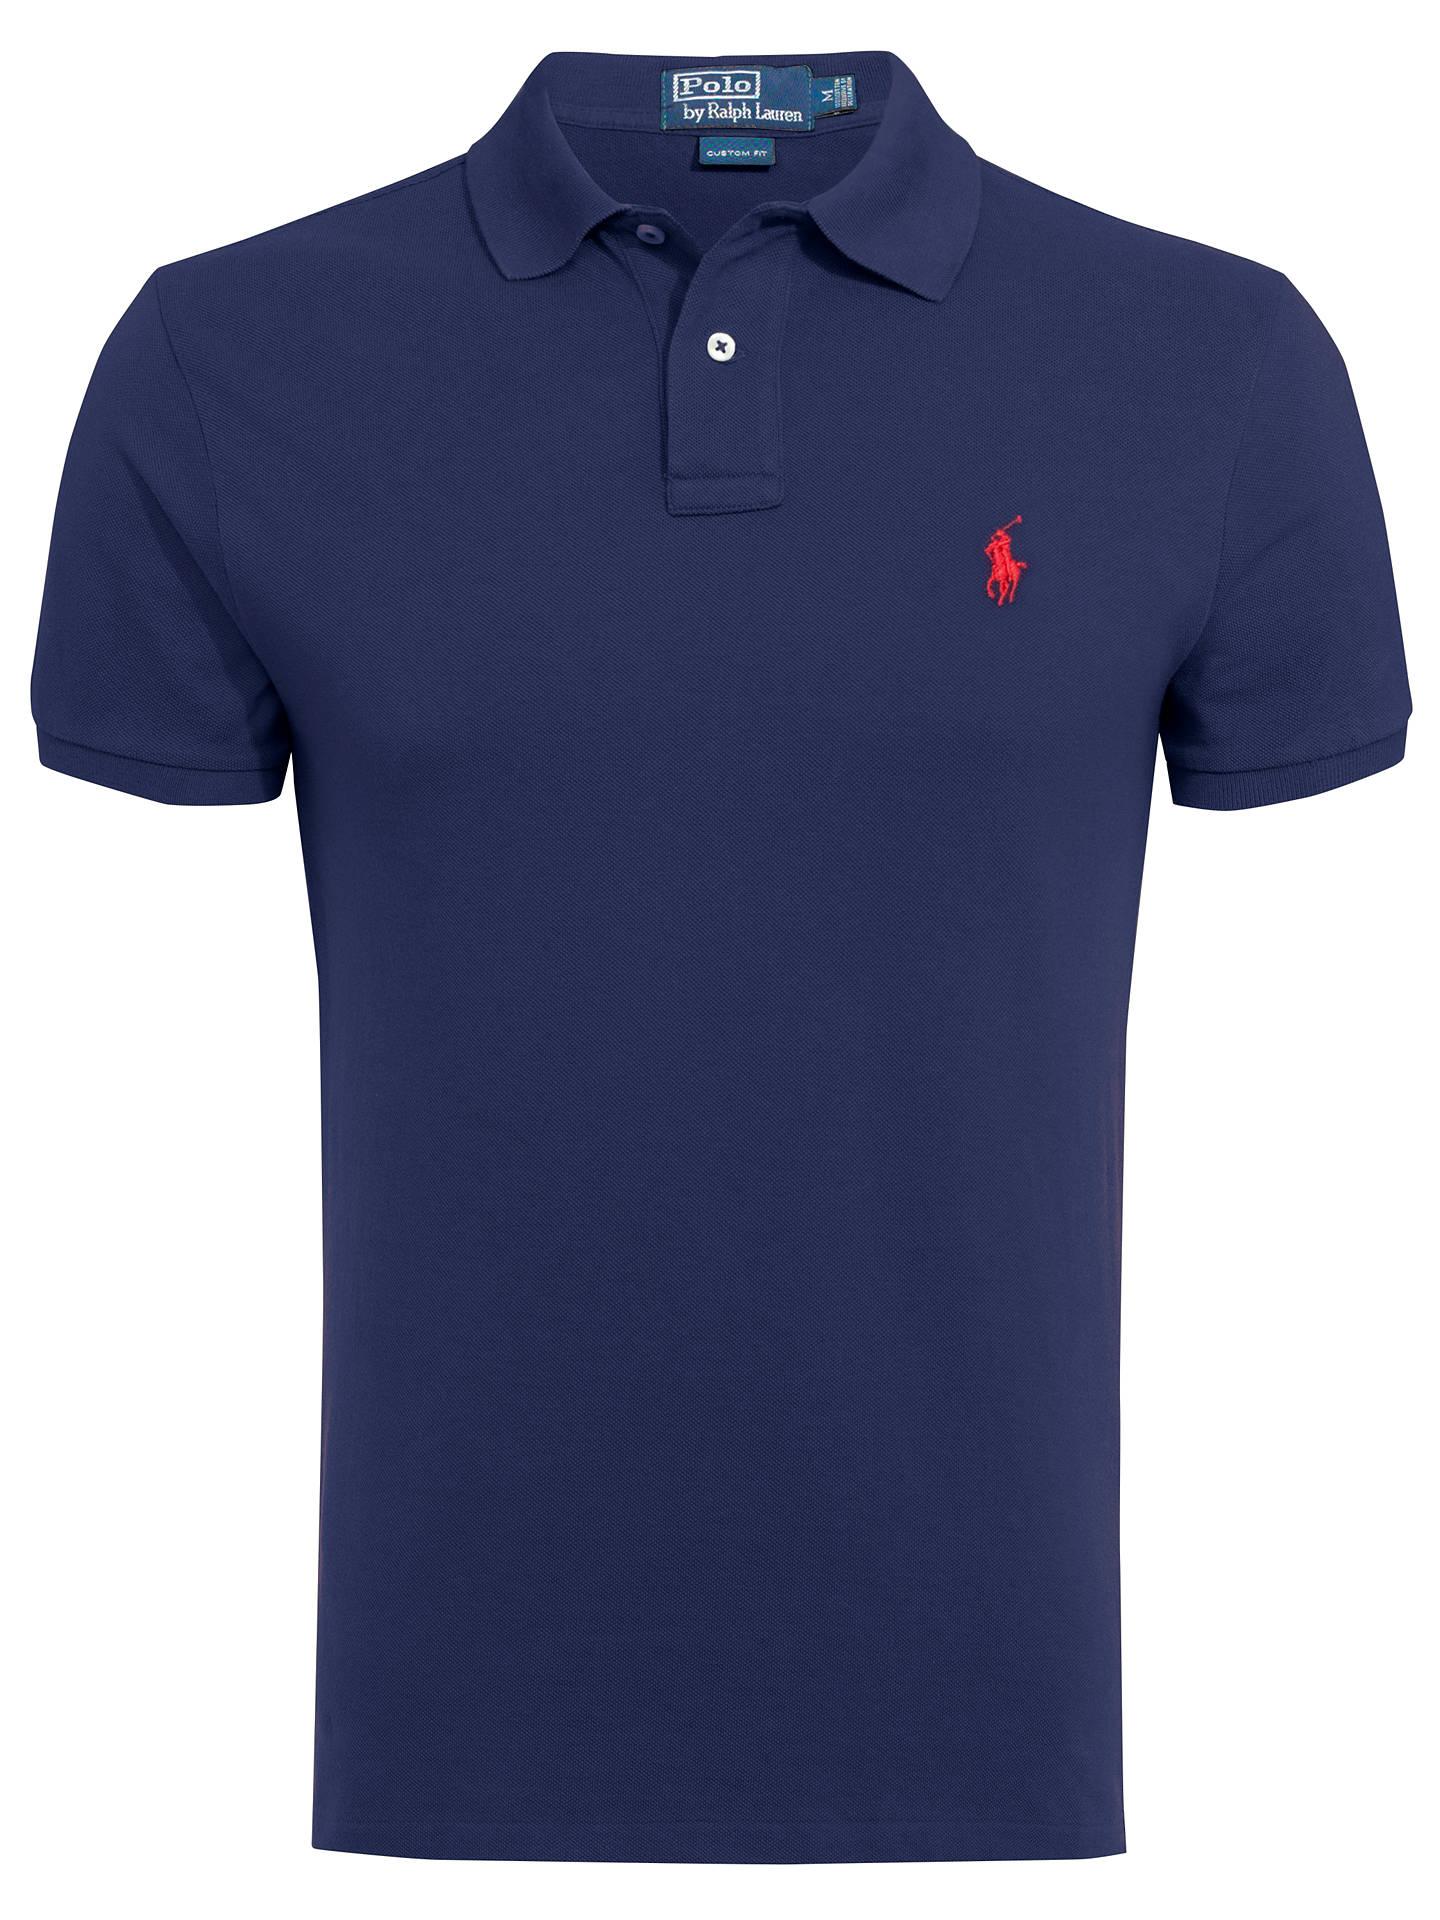 9a1e3a19c0208 Polo Ralph Lauren Custom Fit Short Sleeve Polo Shirt at John Lewis ...